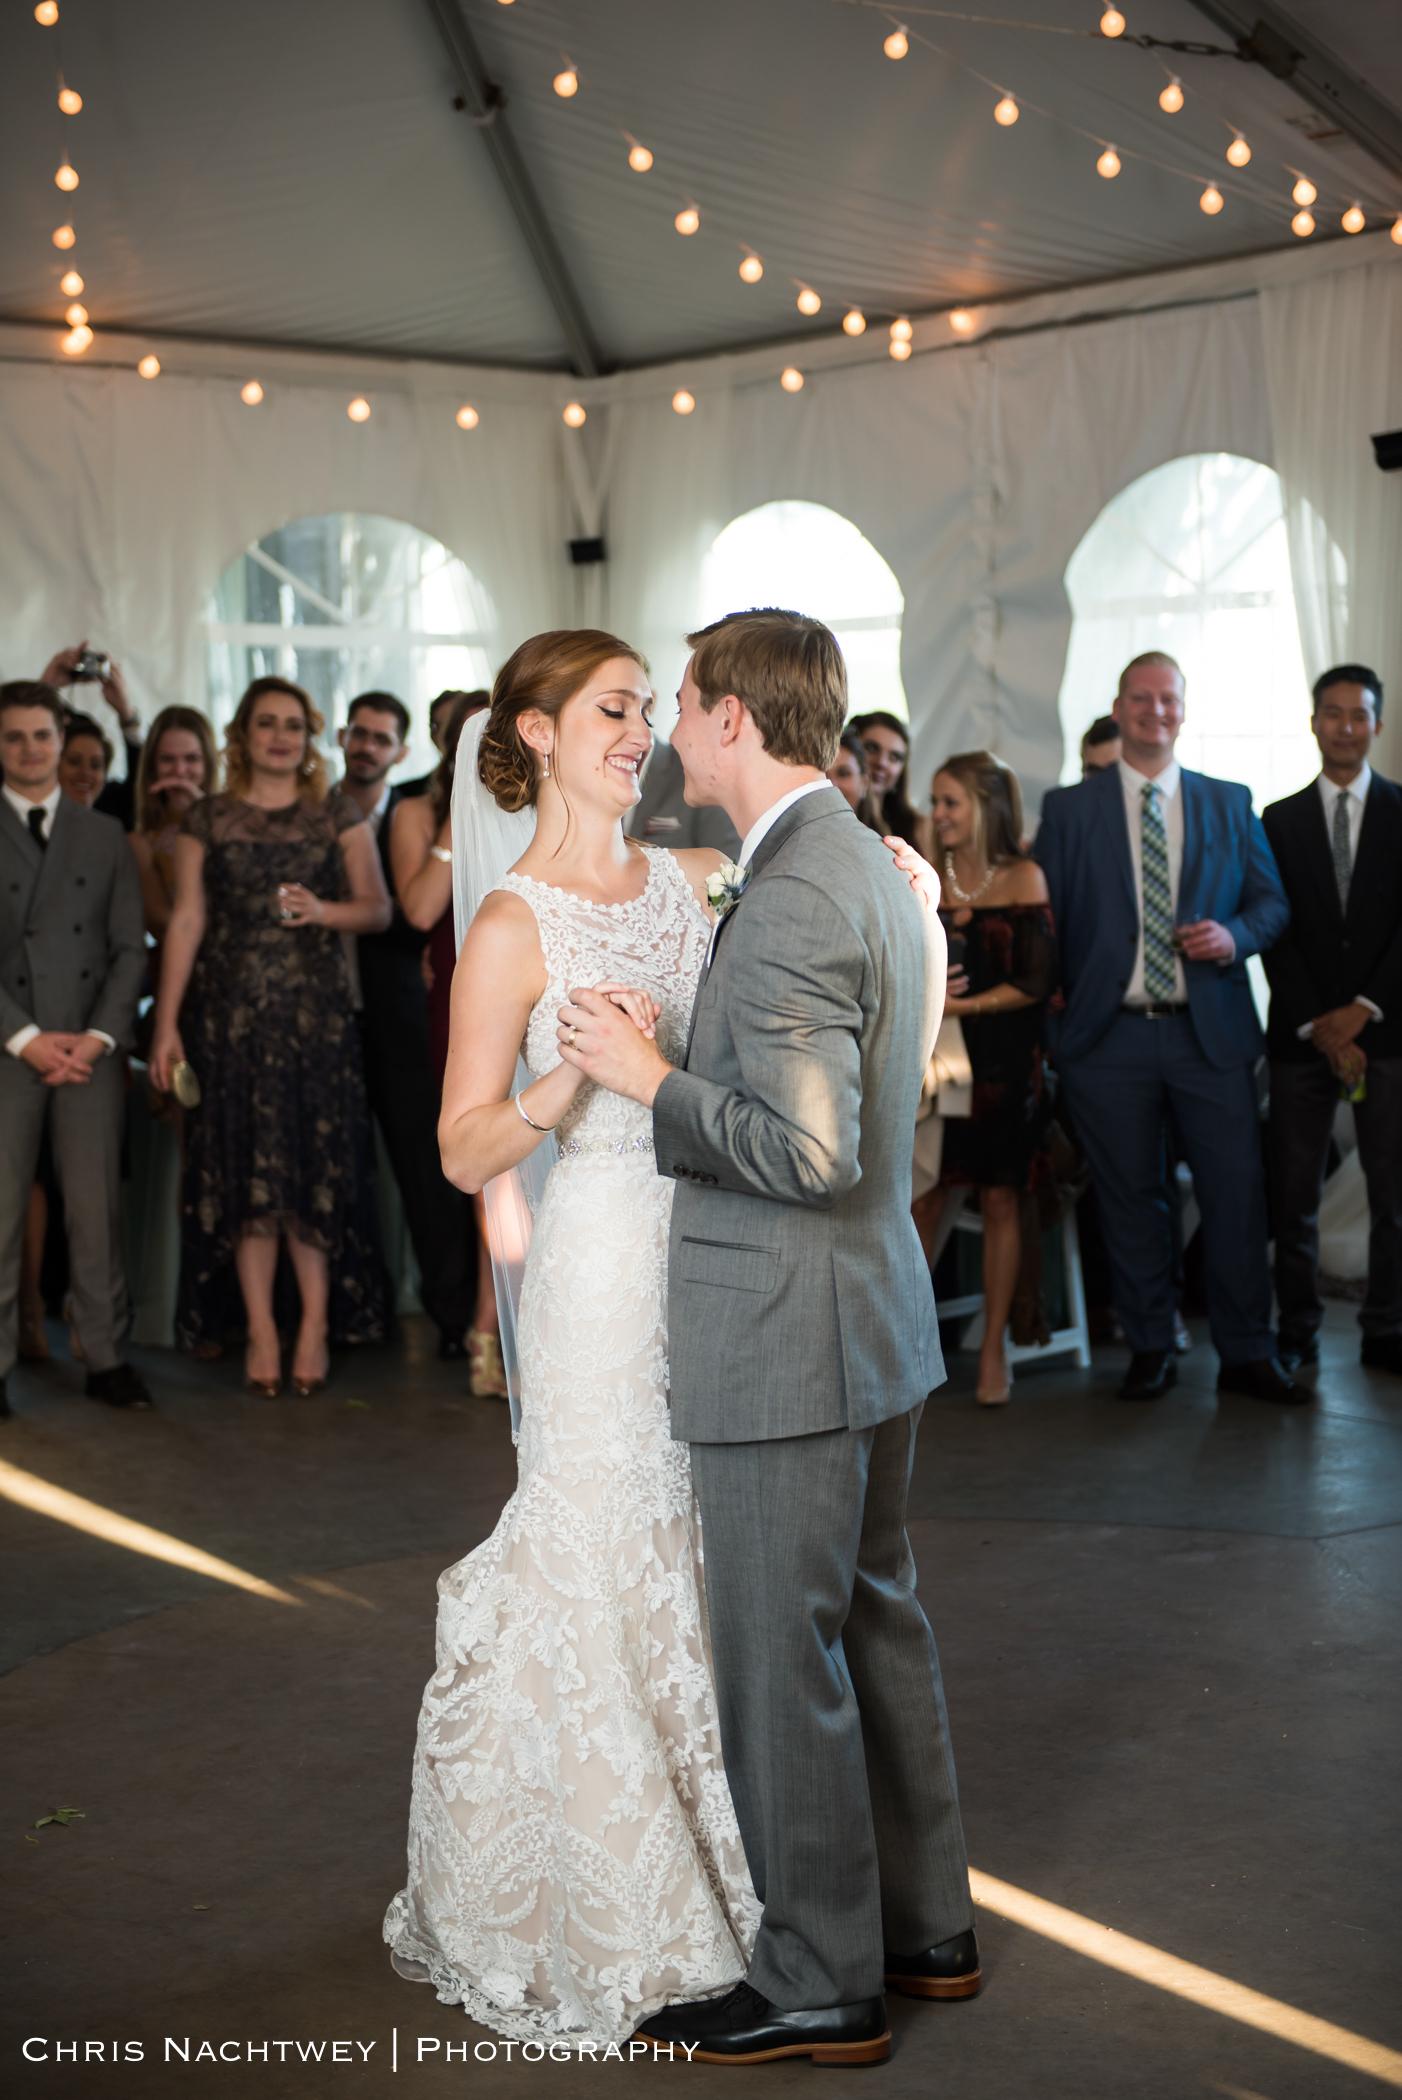 harkness-wedding-photos-chris-nachtwey-photography-2018-24.jpg